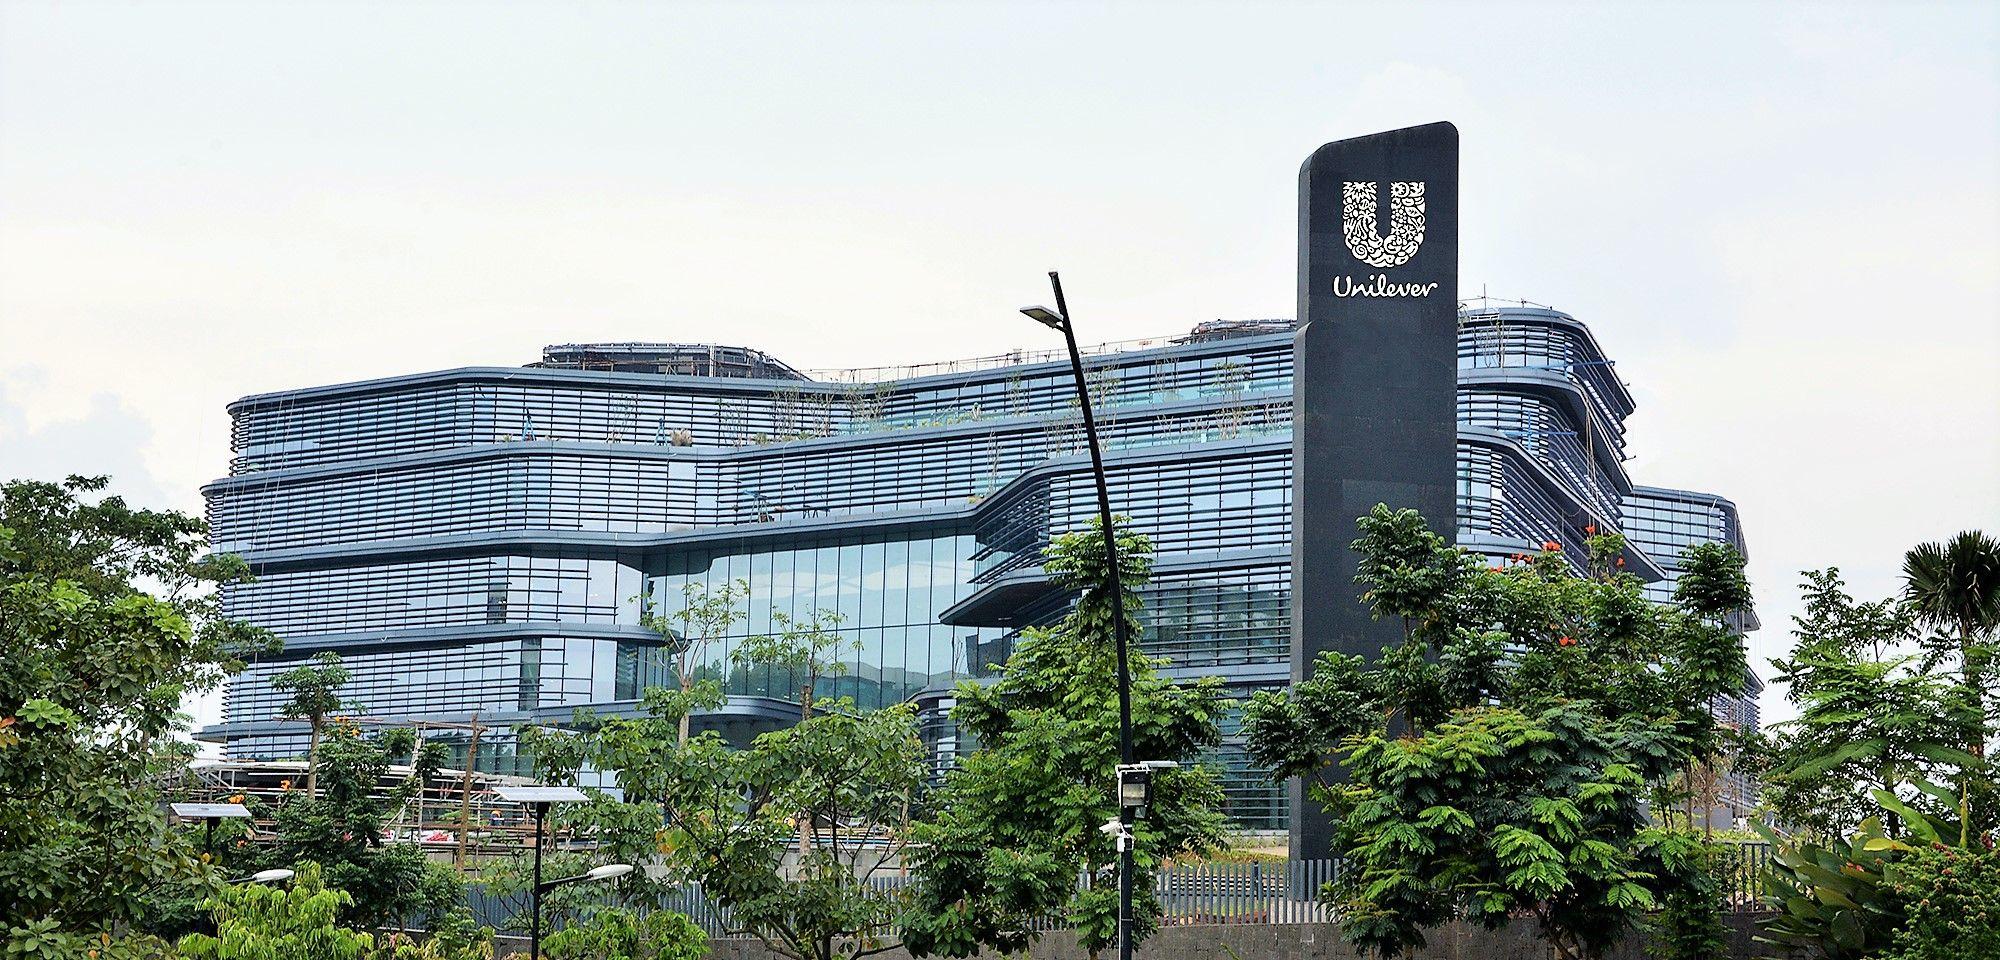 Kinerja Saham Unilever  Berpotensi Uptrend? Begini Proyeksi Mirae Asset Sekuritas